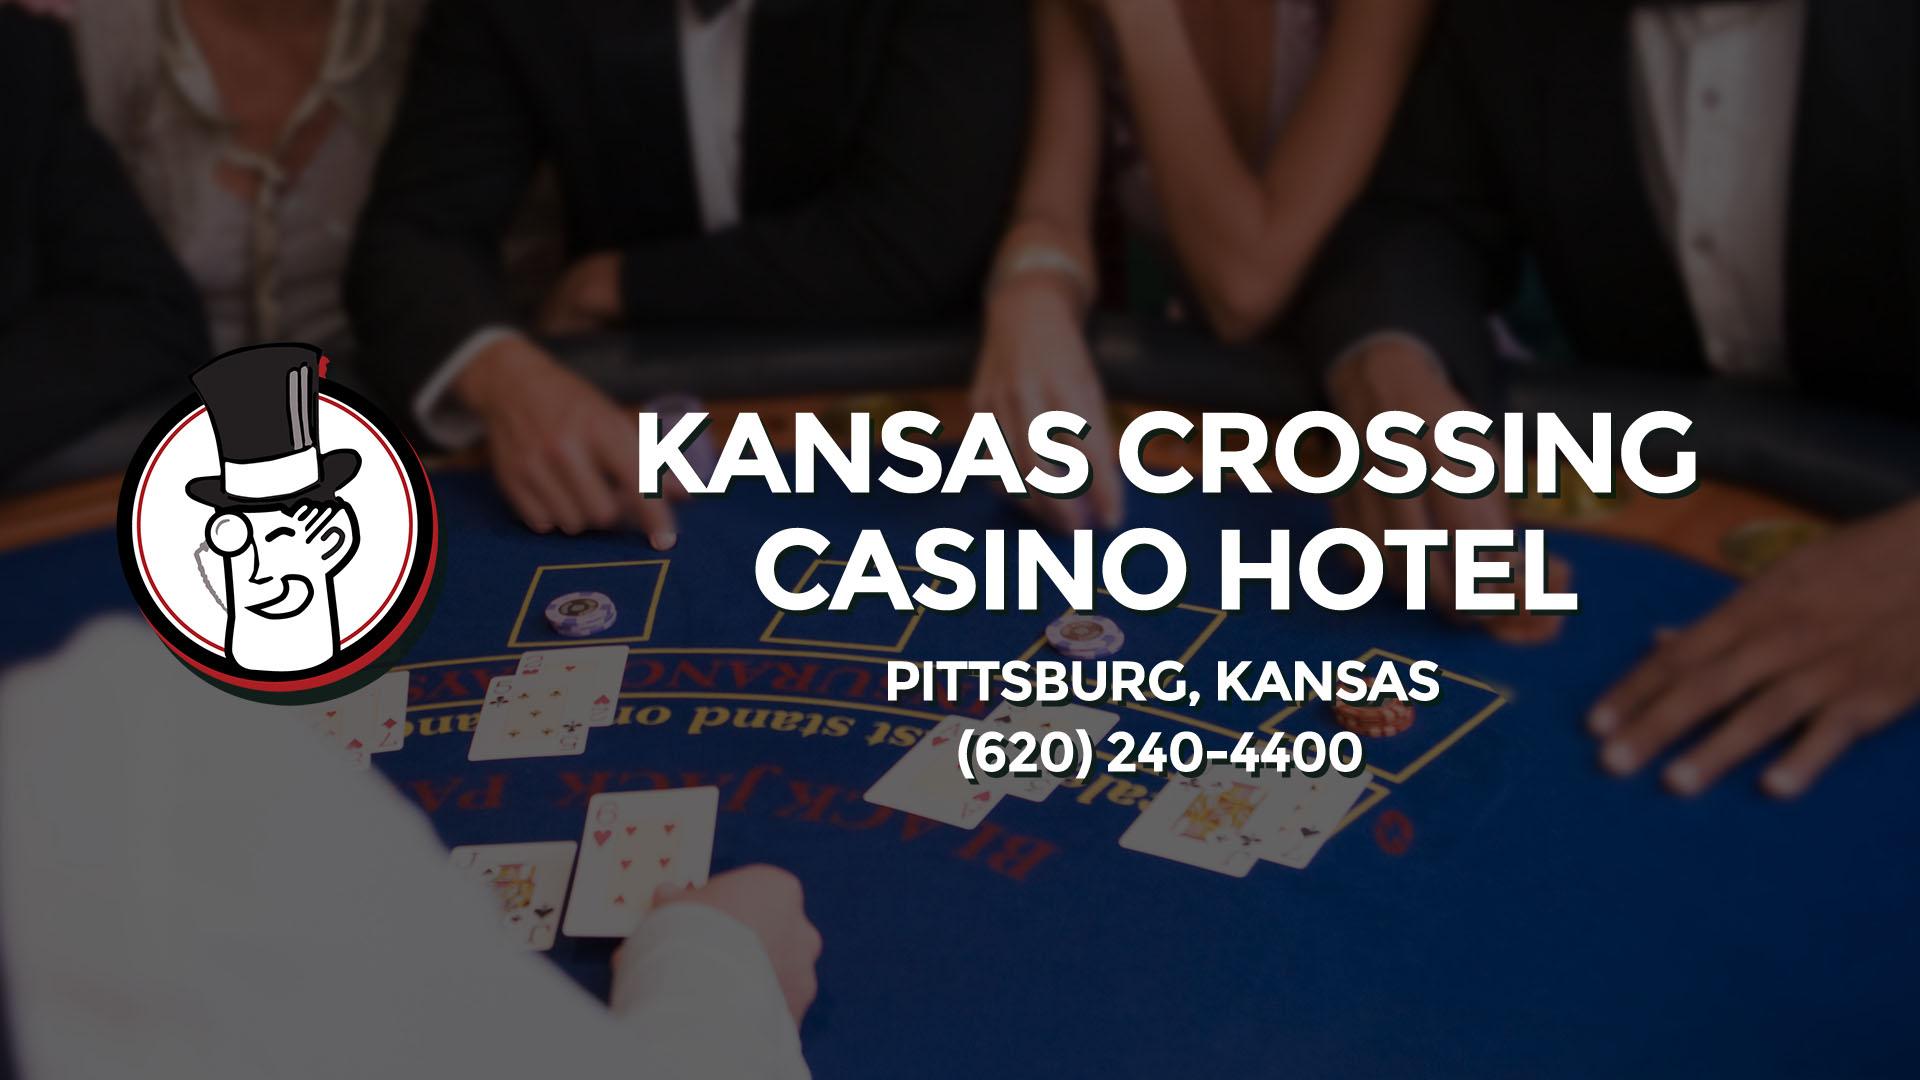 KANSAS CROSSING CASINO  HOTEL PITTSBURG KS